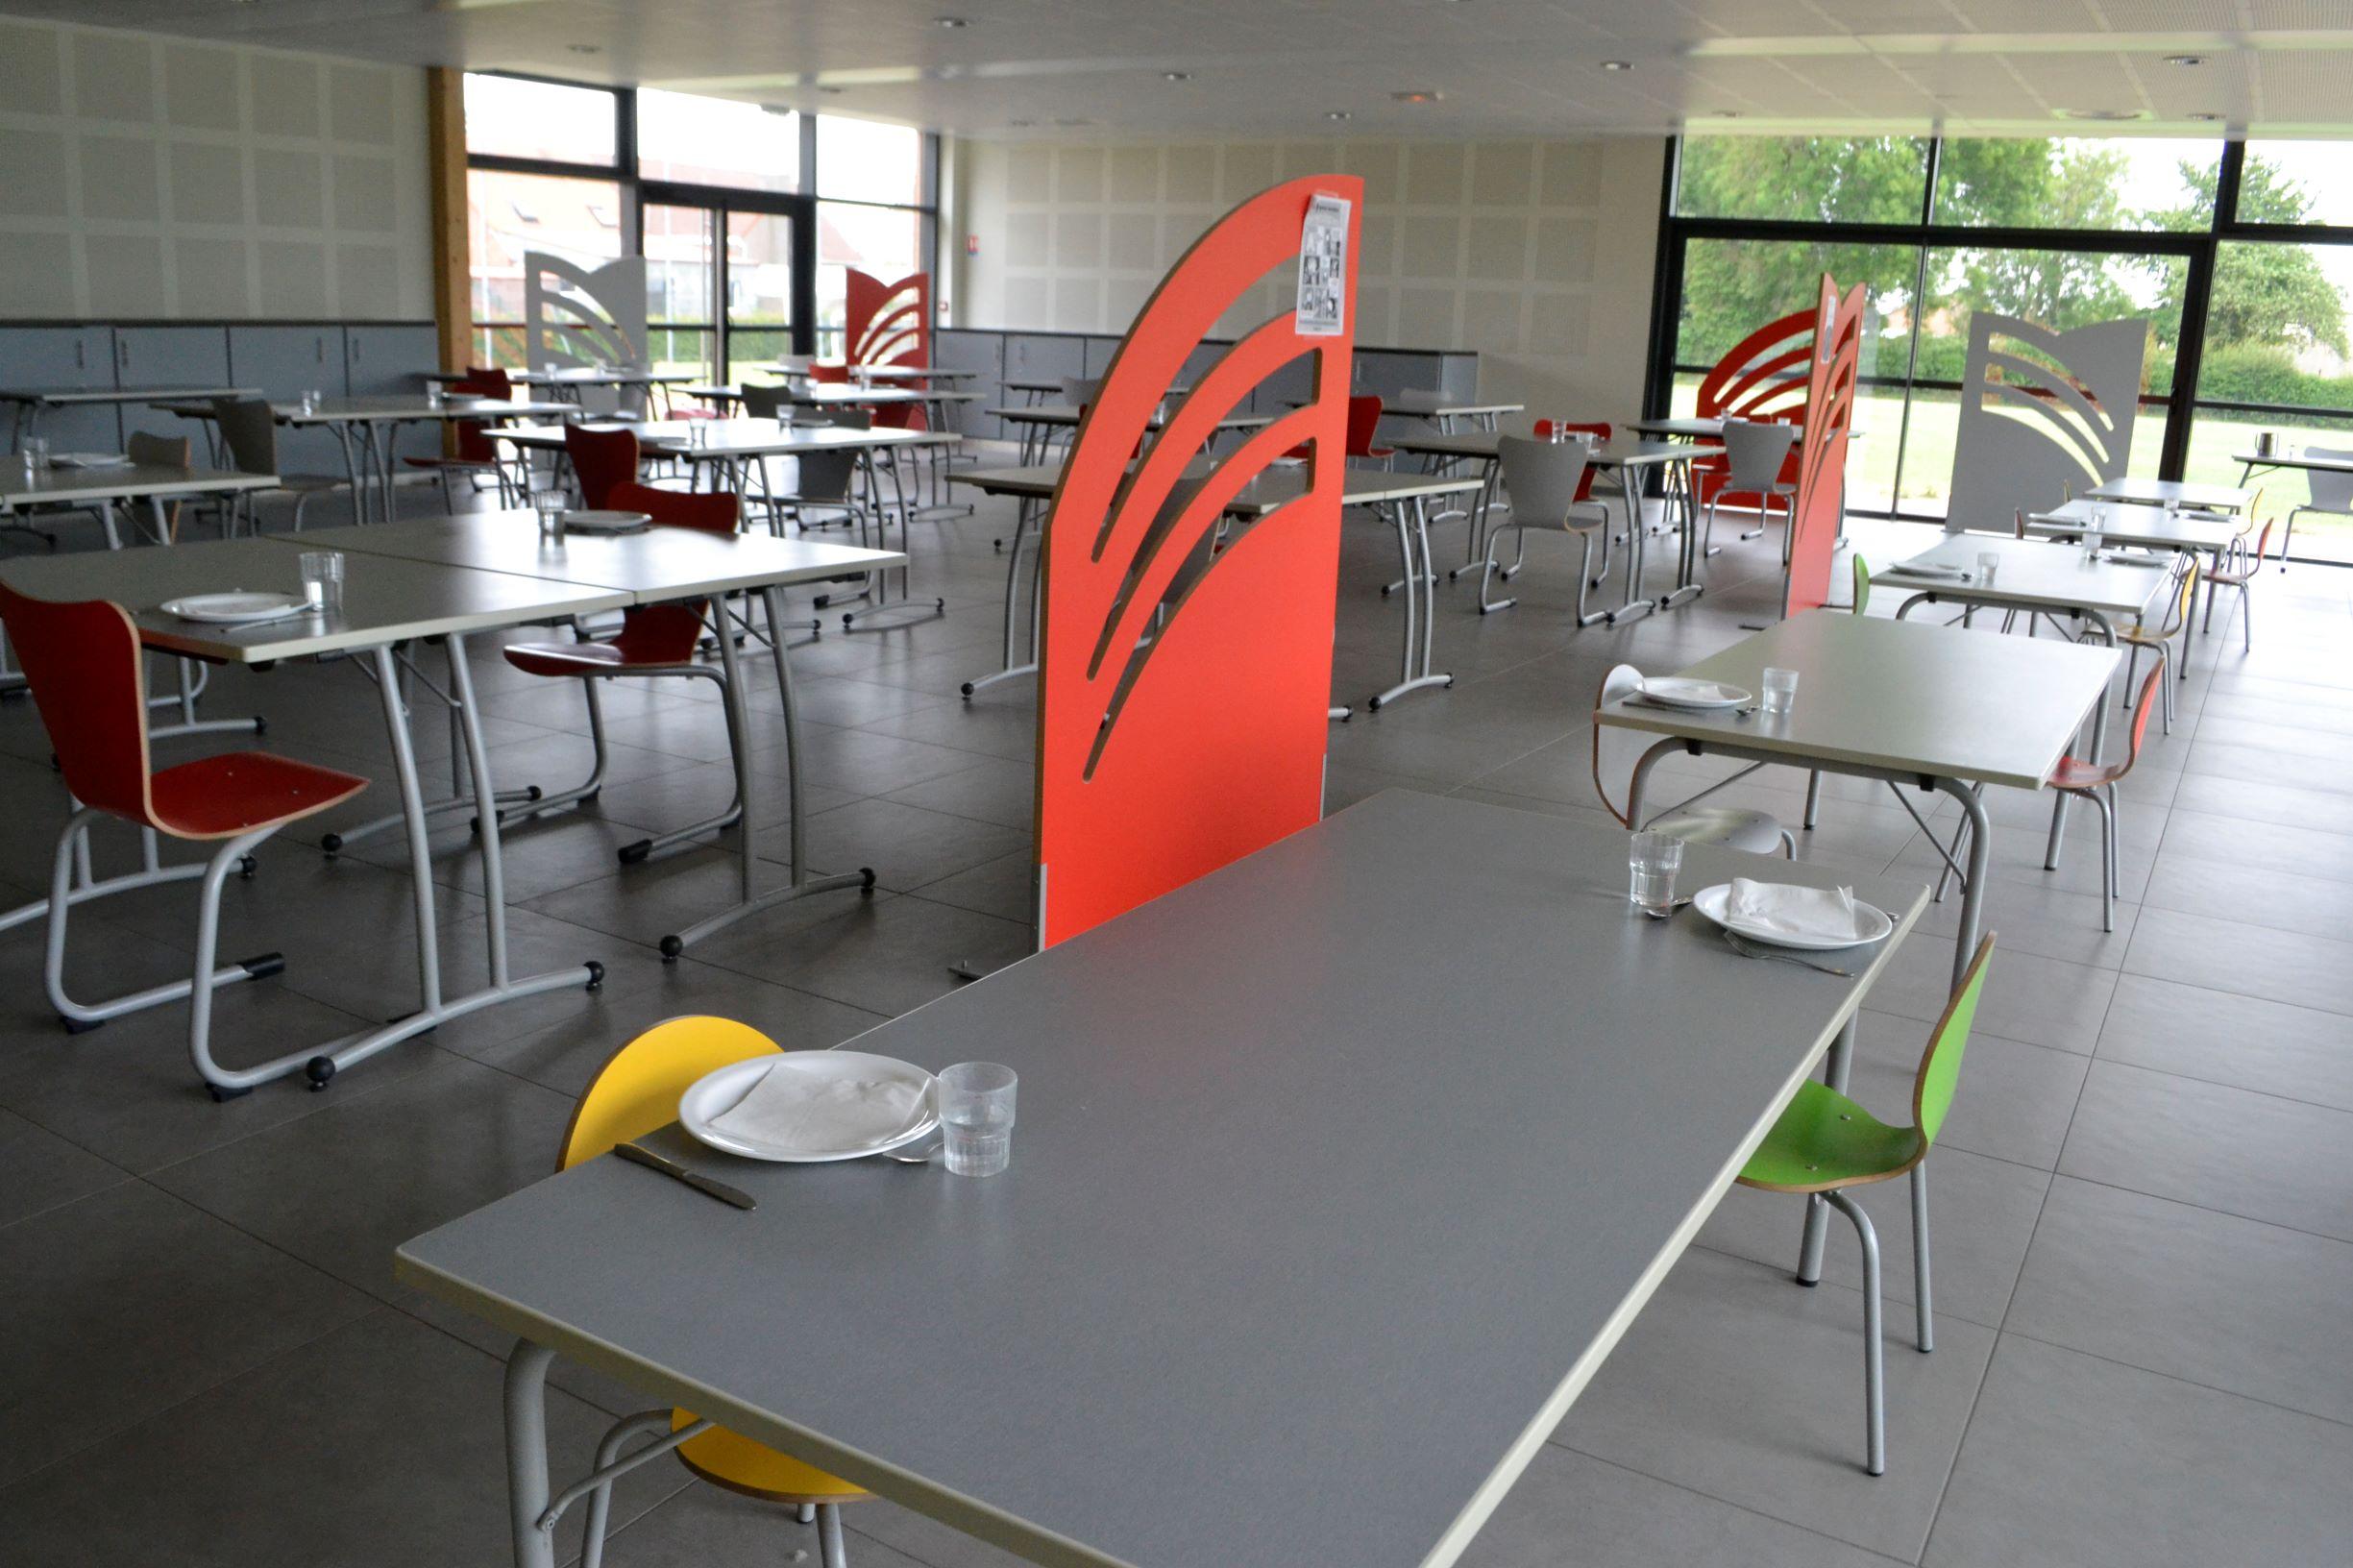 Cantine_salle_restaurant_5.jpg